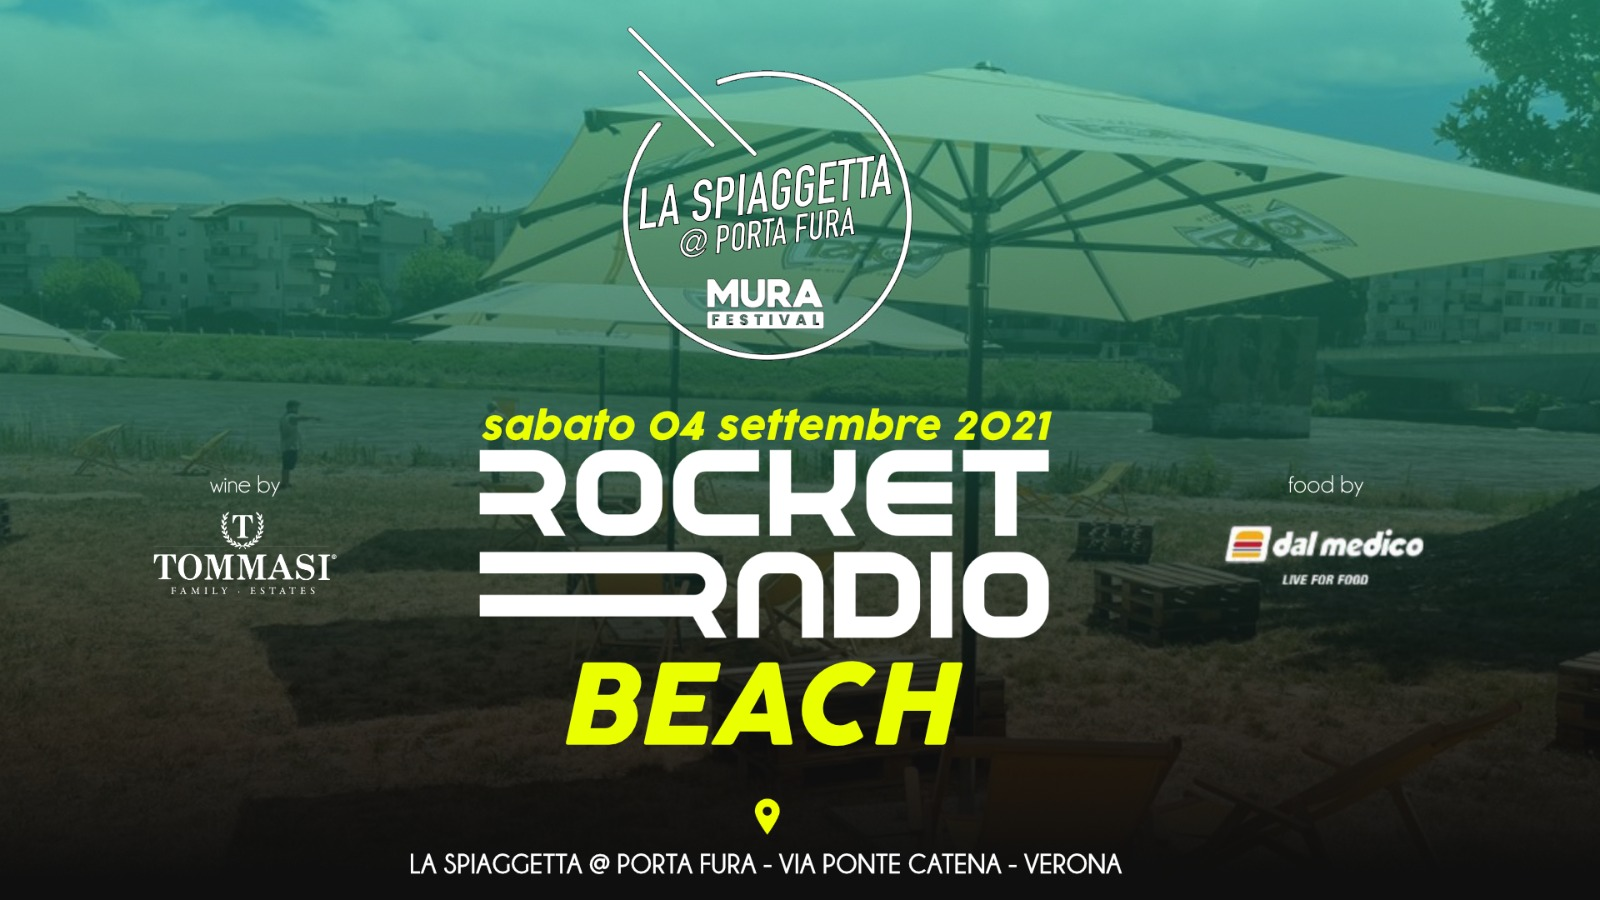 Rocket Radio Beach 4 settembre 2021